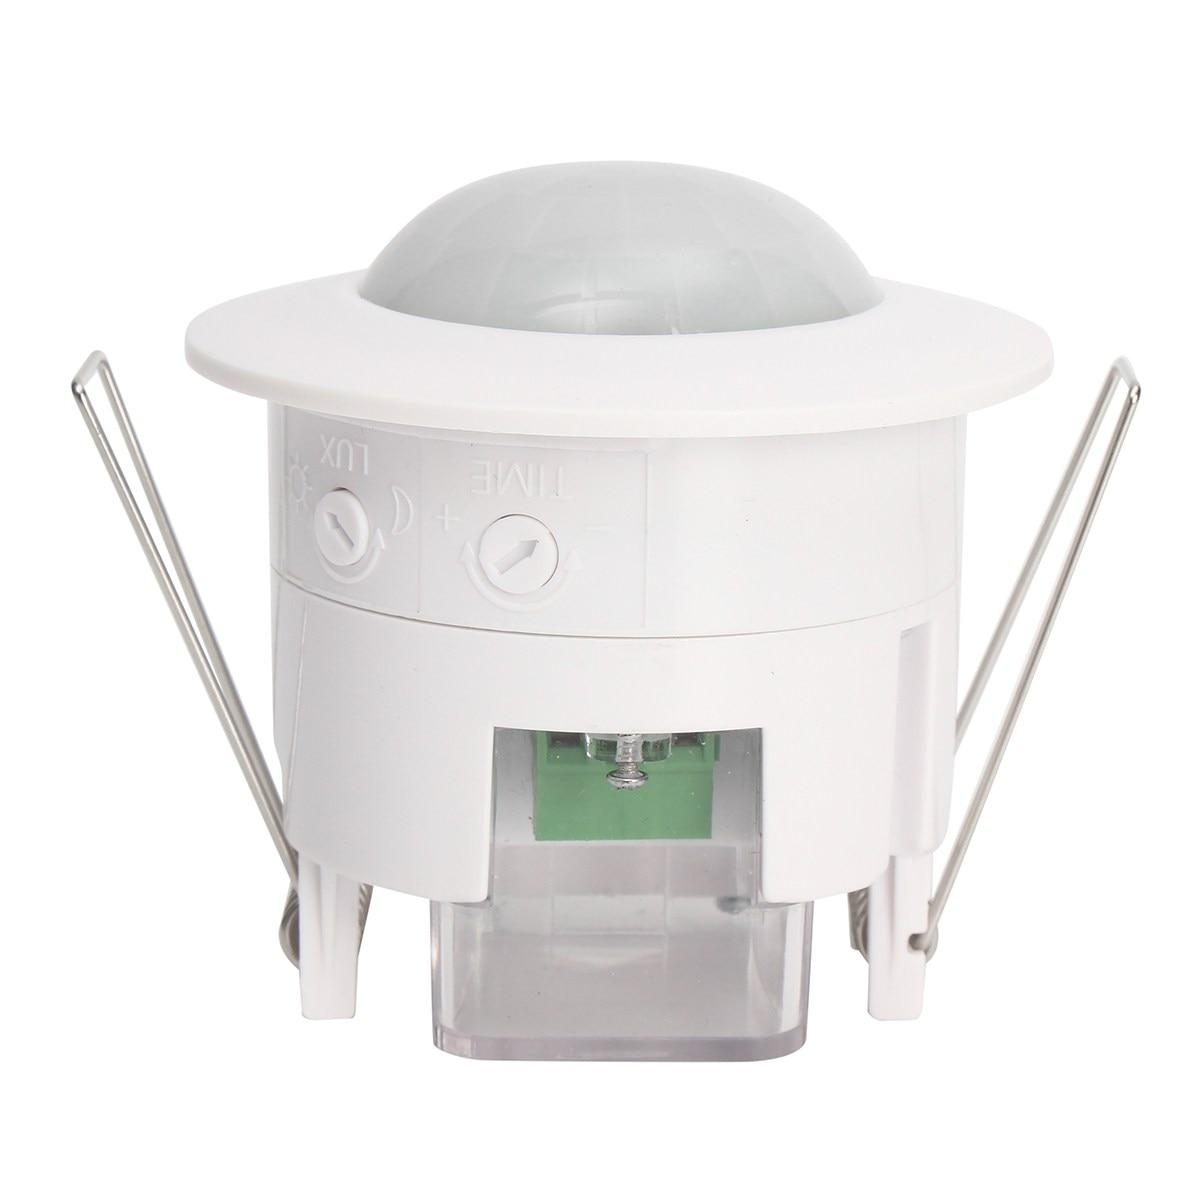 Safurance 110V-240V Infrared Ceiling PIR Body Motion Sensor Detector Light Lamp Switch 360 Home Automation new safurance ac110v 240v outdoor human body infrared detector motion sensor switch black home automation